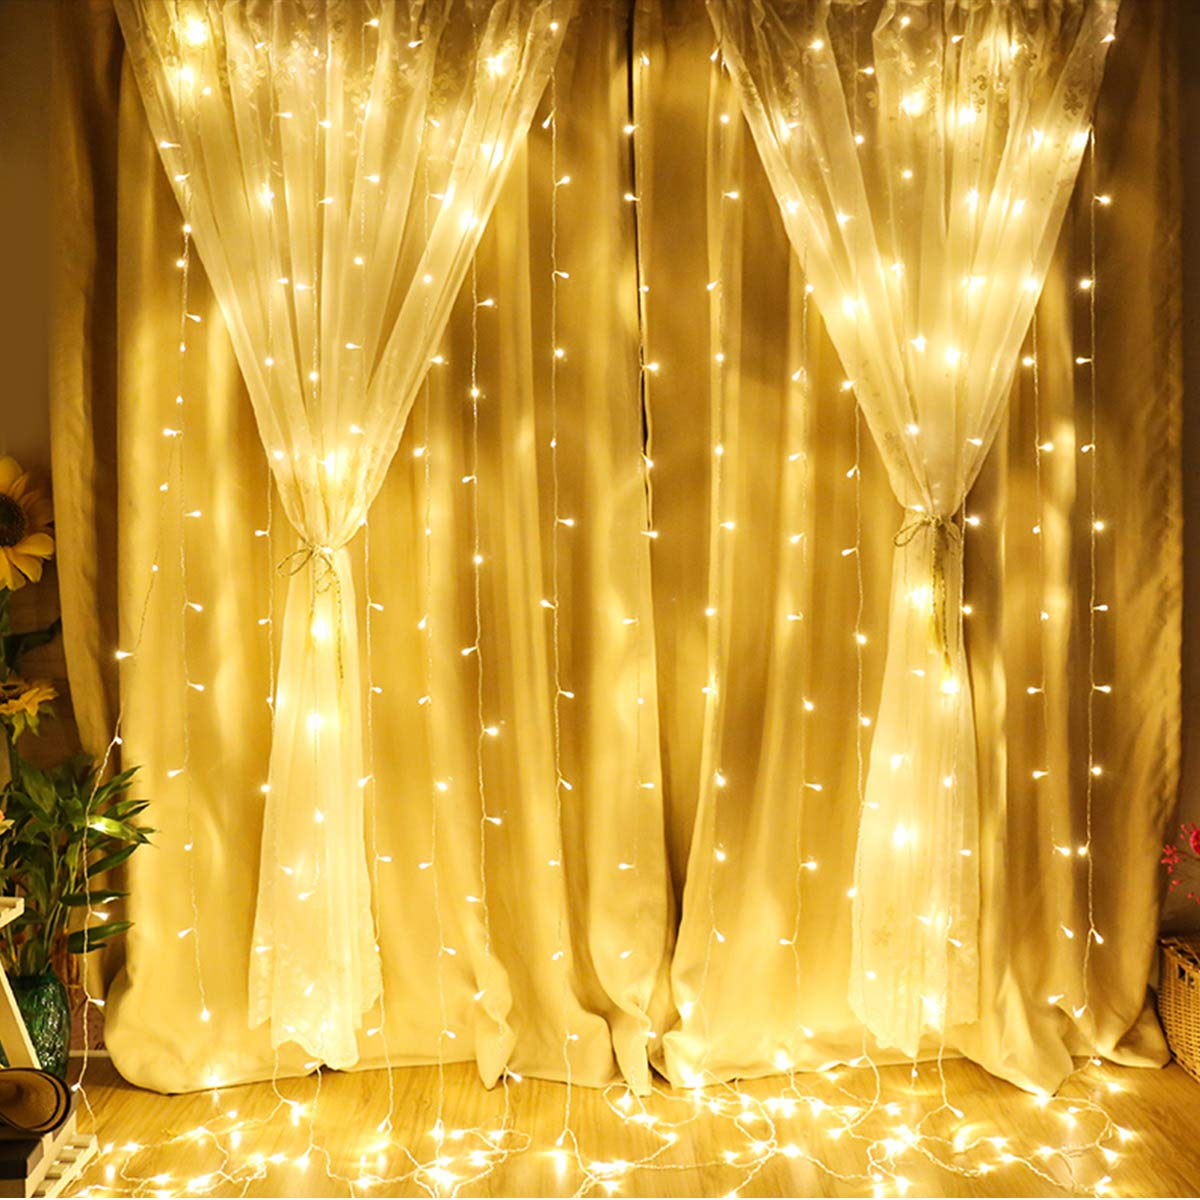 1d469e477 LE Cortina de Luces LED 3m x 3m 306 LED, Blanco Cálido, Resistente al Agua,  8 Modos de Luz, Decoración de casa, arbol de Navidad, etc